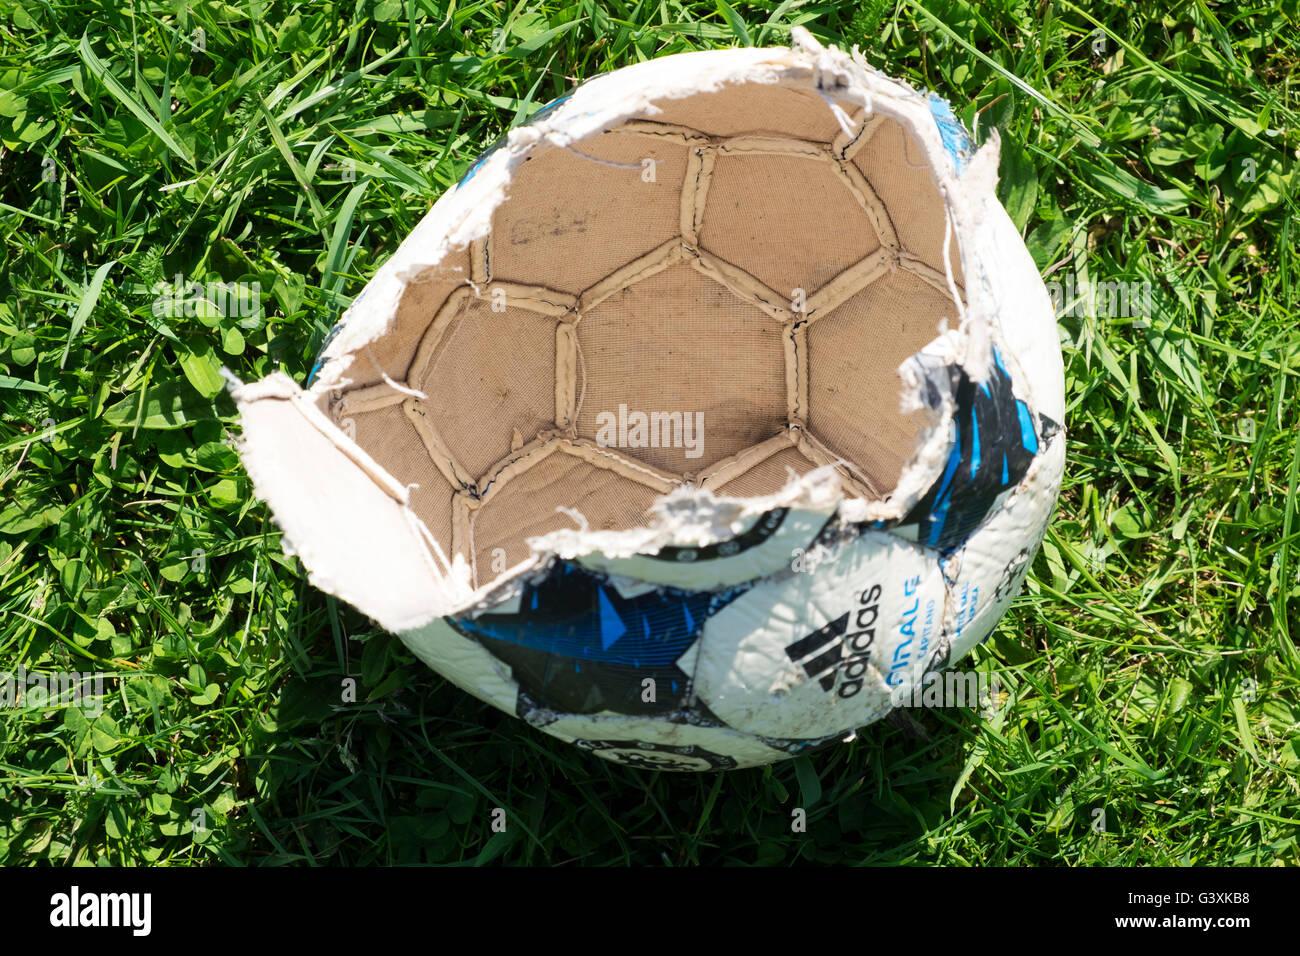 Burst Adidas Finale Capitano football - Stock Image